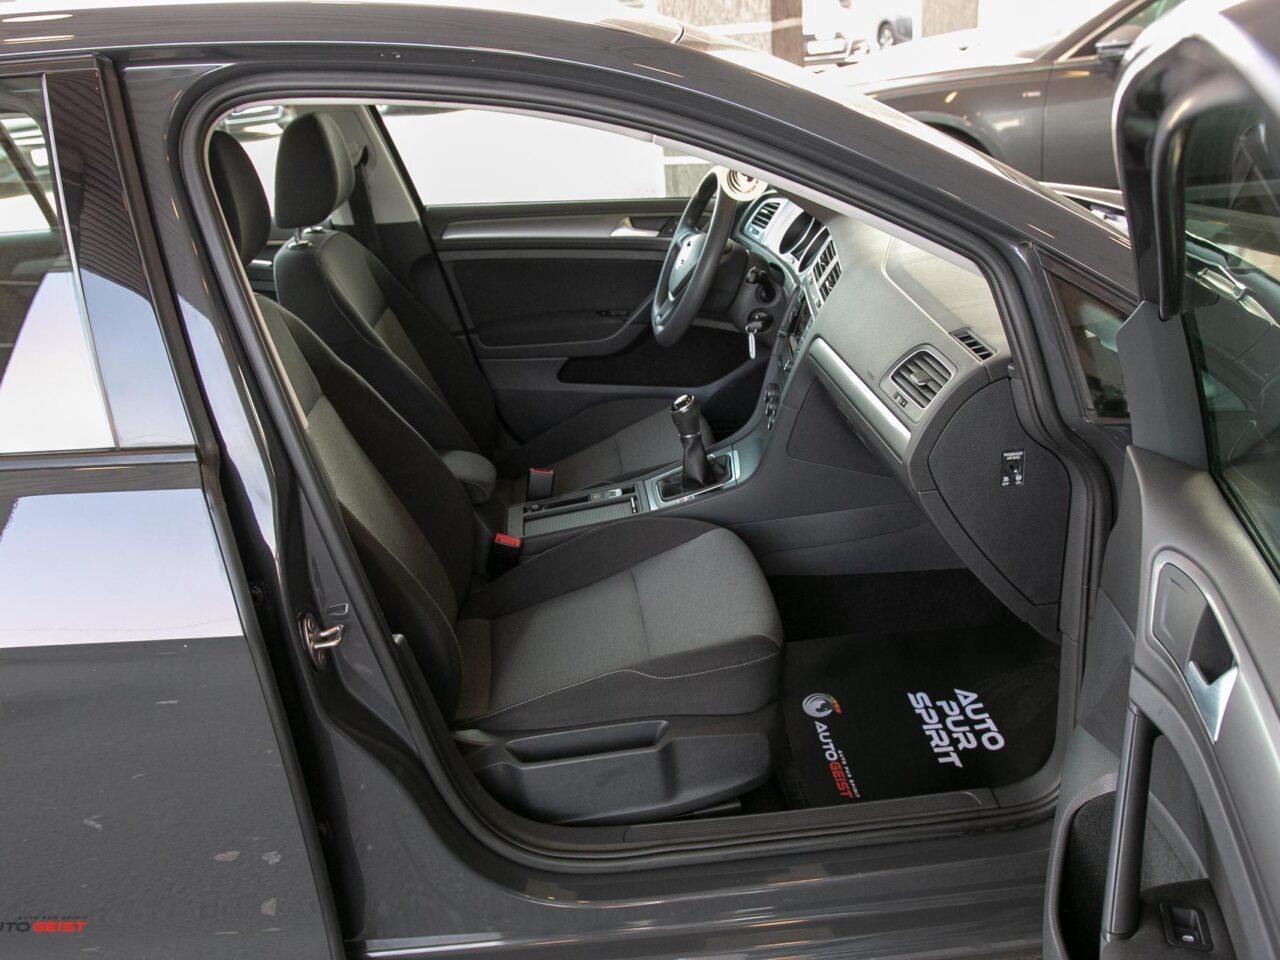 VW-golf-7-scurt-2016-3314